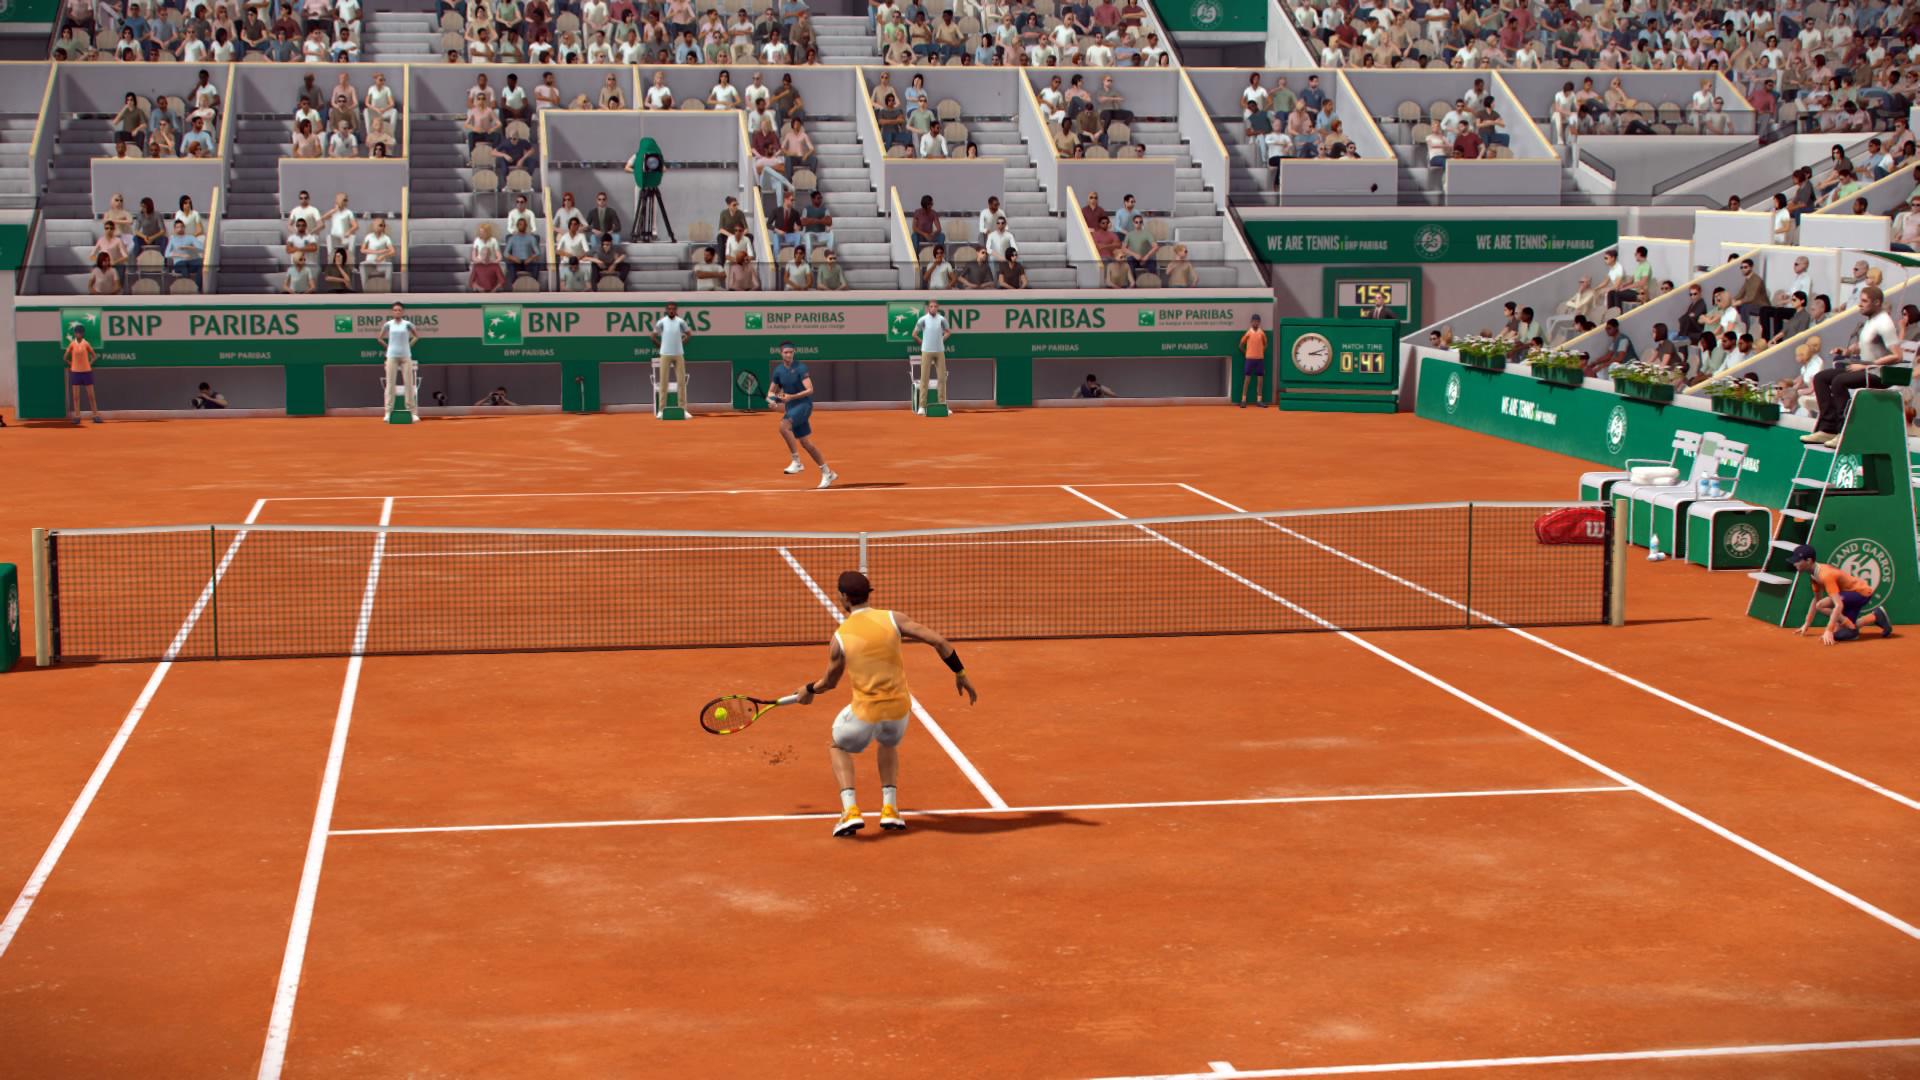 TennisWorldTour-RolandGarrosEdition Multi Test 003